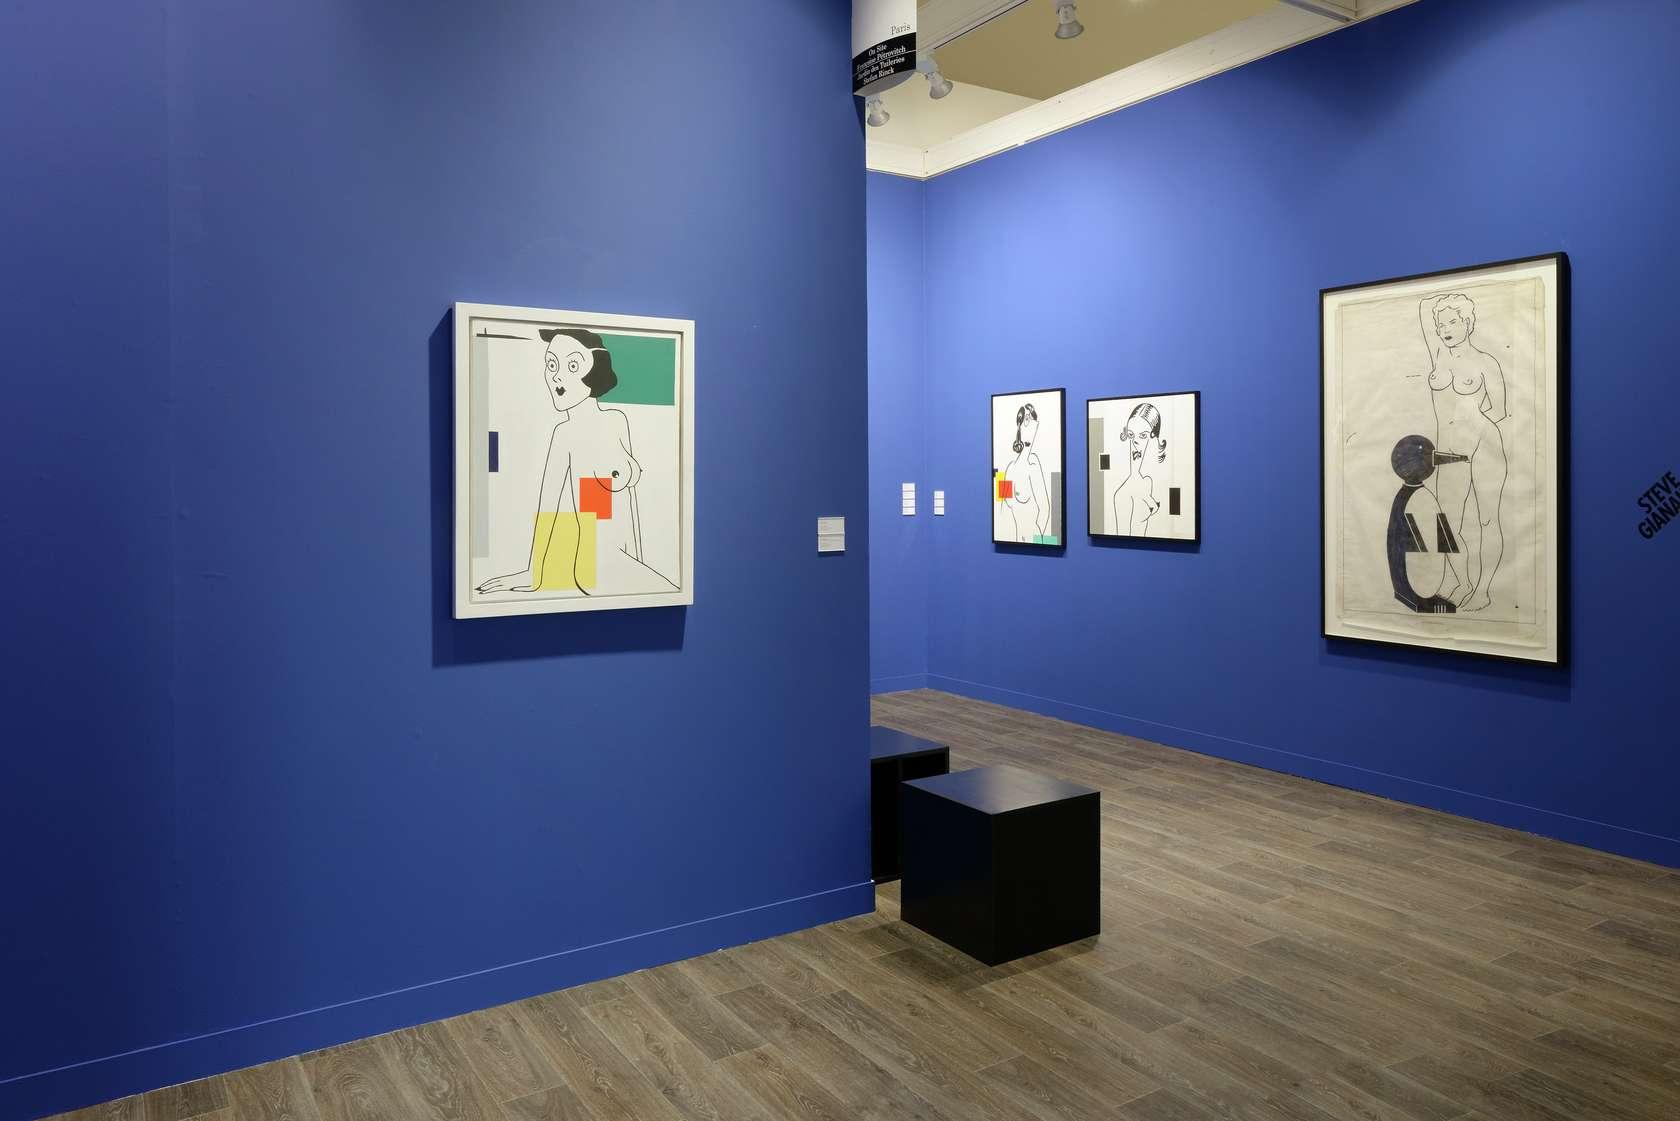 Steve Gianakos Fiac, Paris (FR) Semiose 18 — 21 octobre 2017